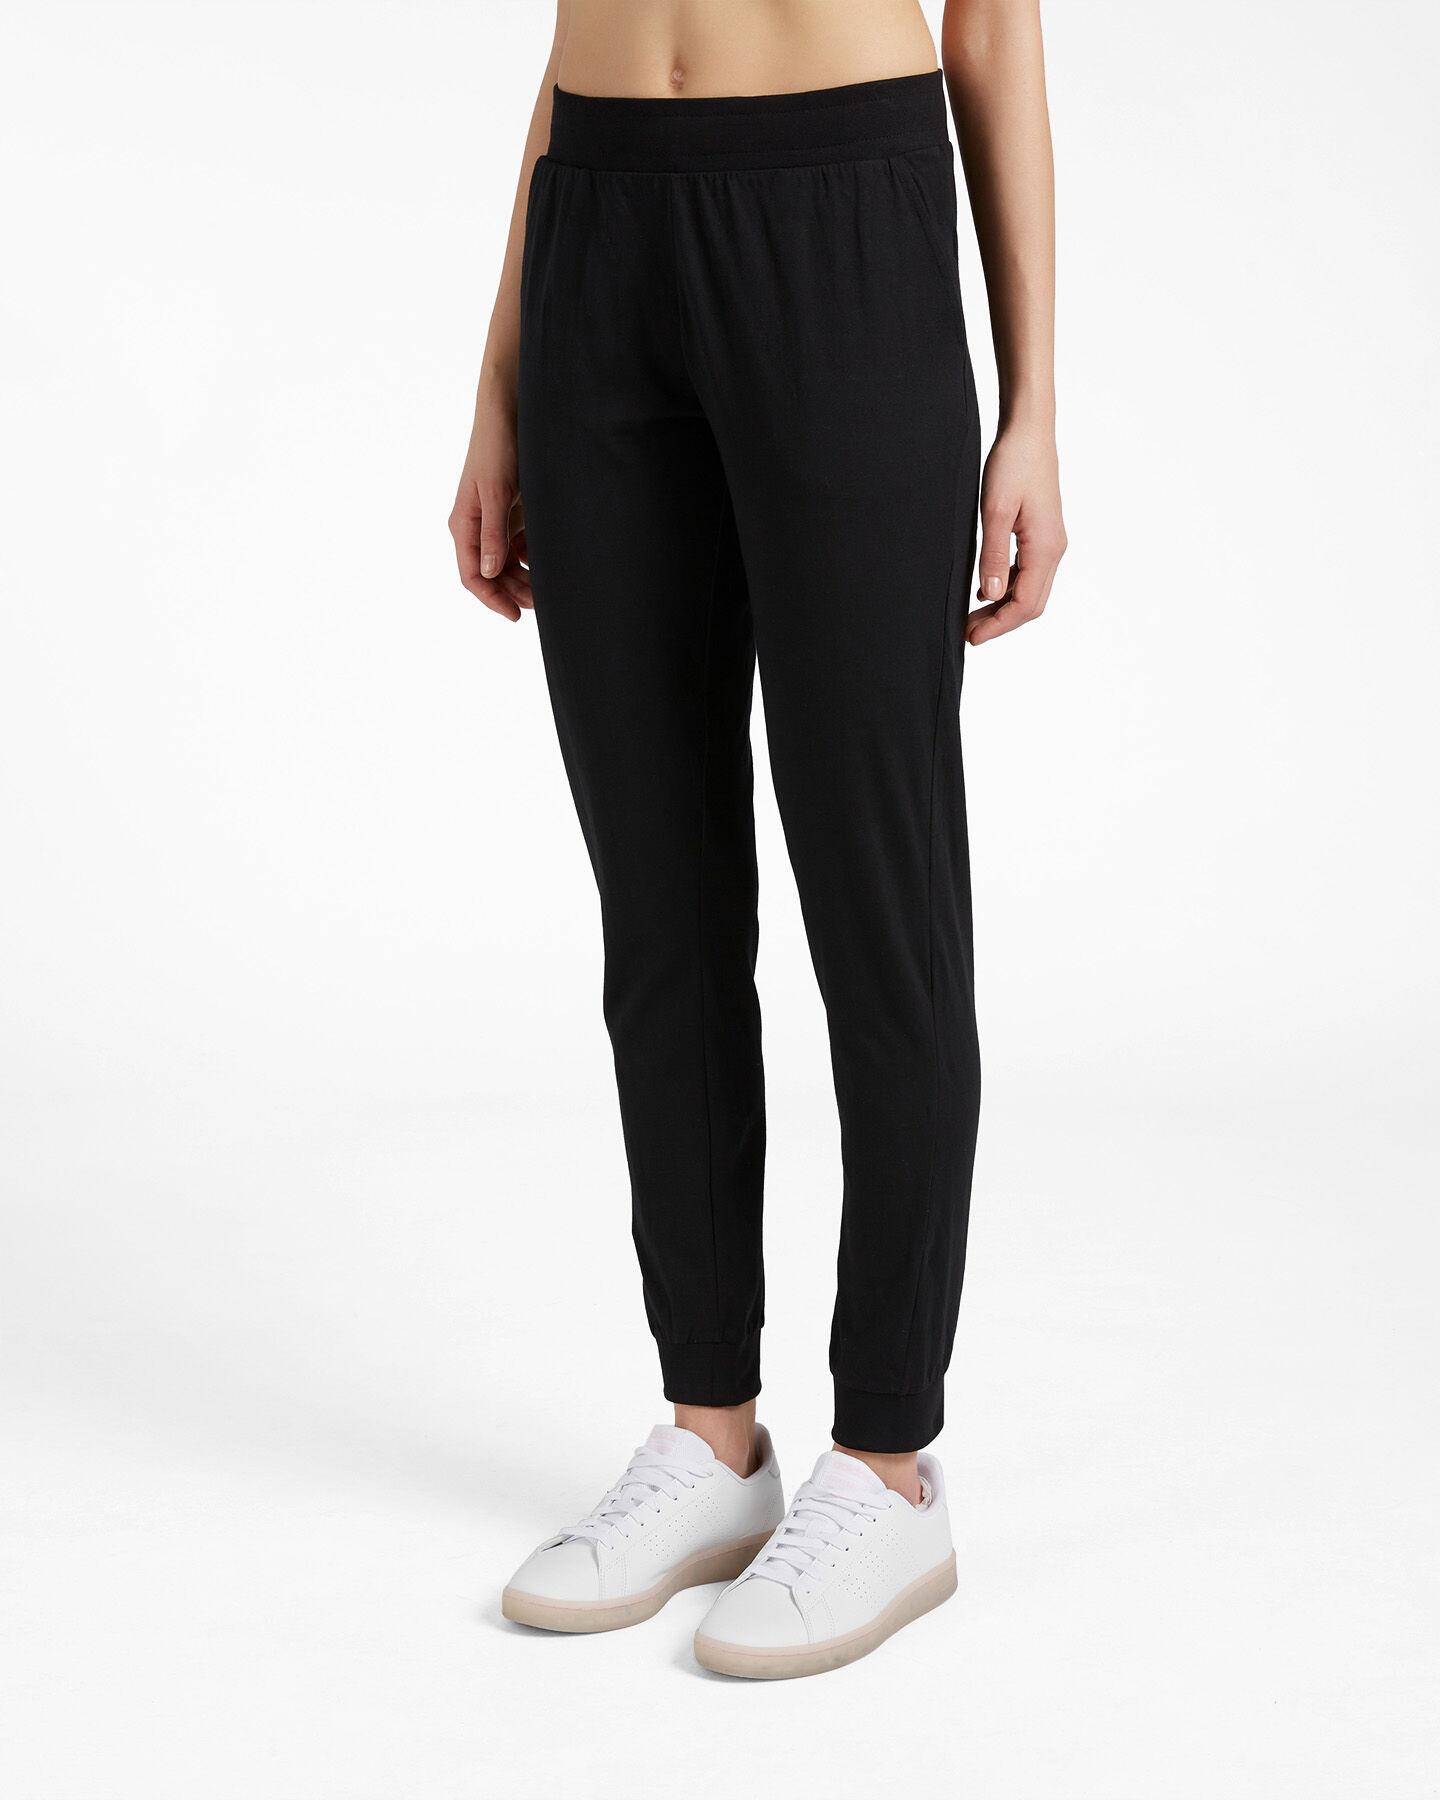 Pantalone ABC JERSEY W S5296354 scatto 2